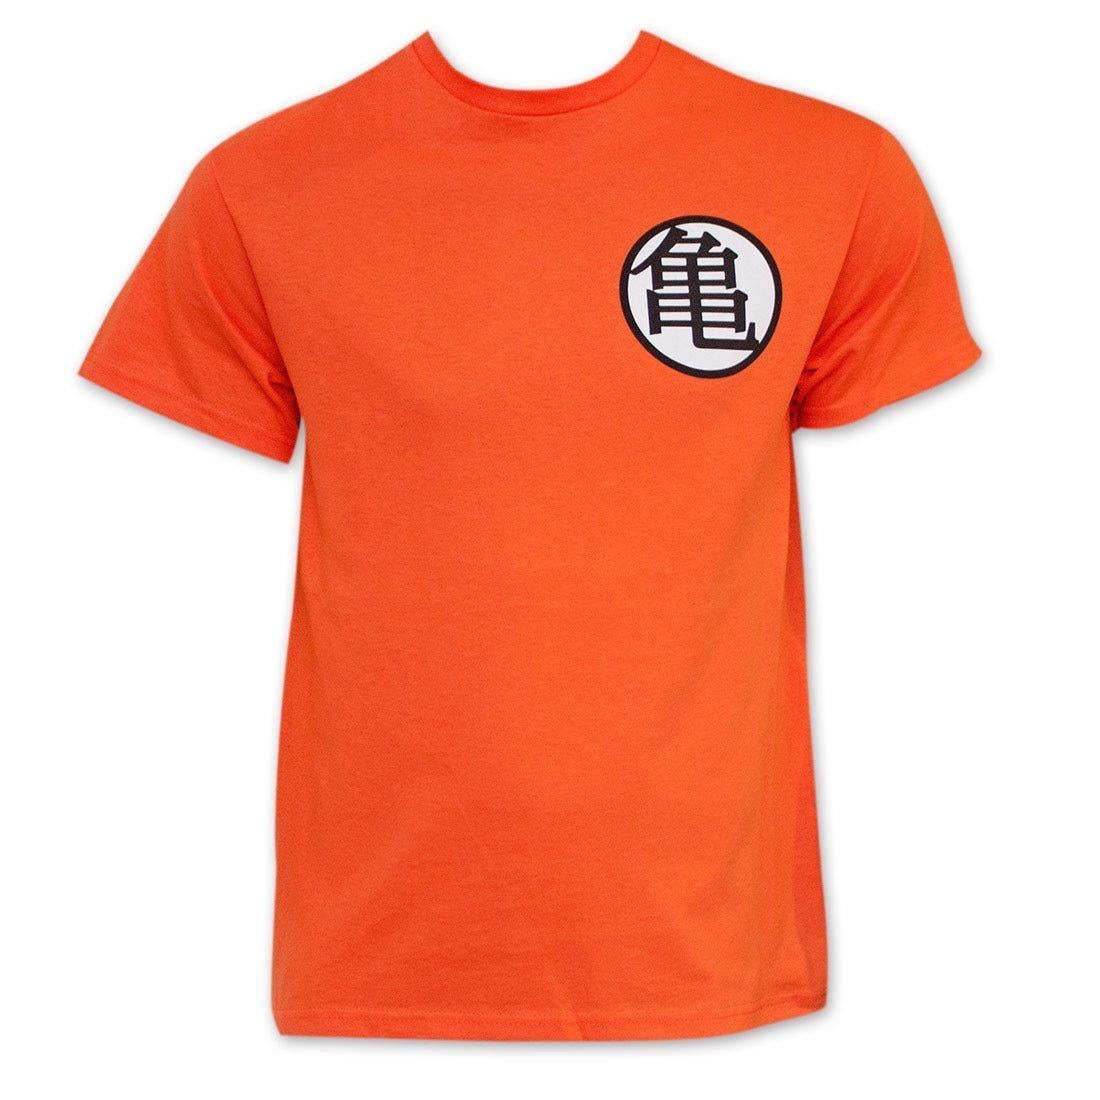 Dragon ball z king kai goku symbol costume t shirt products dragon ball z king kai goku symbol costume t shirt buycottarizona Choice Image